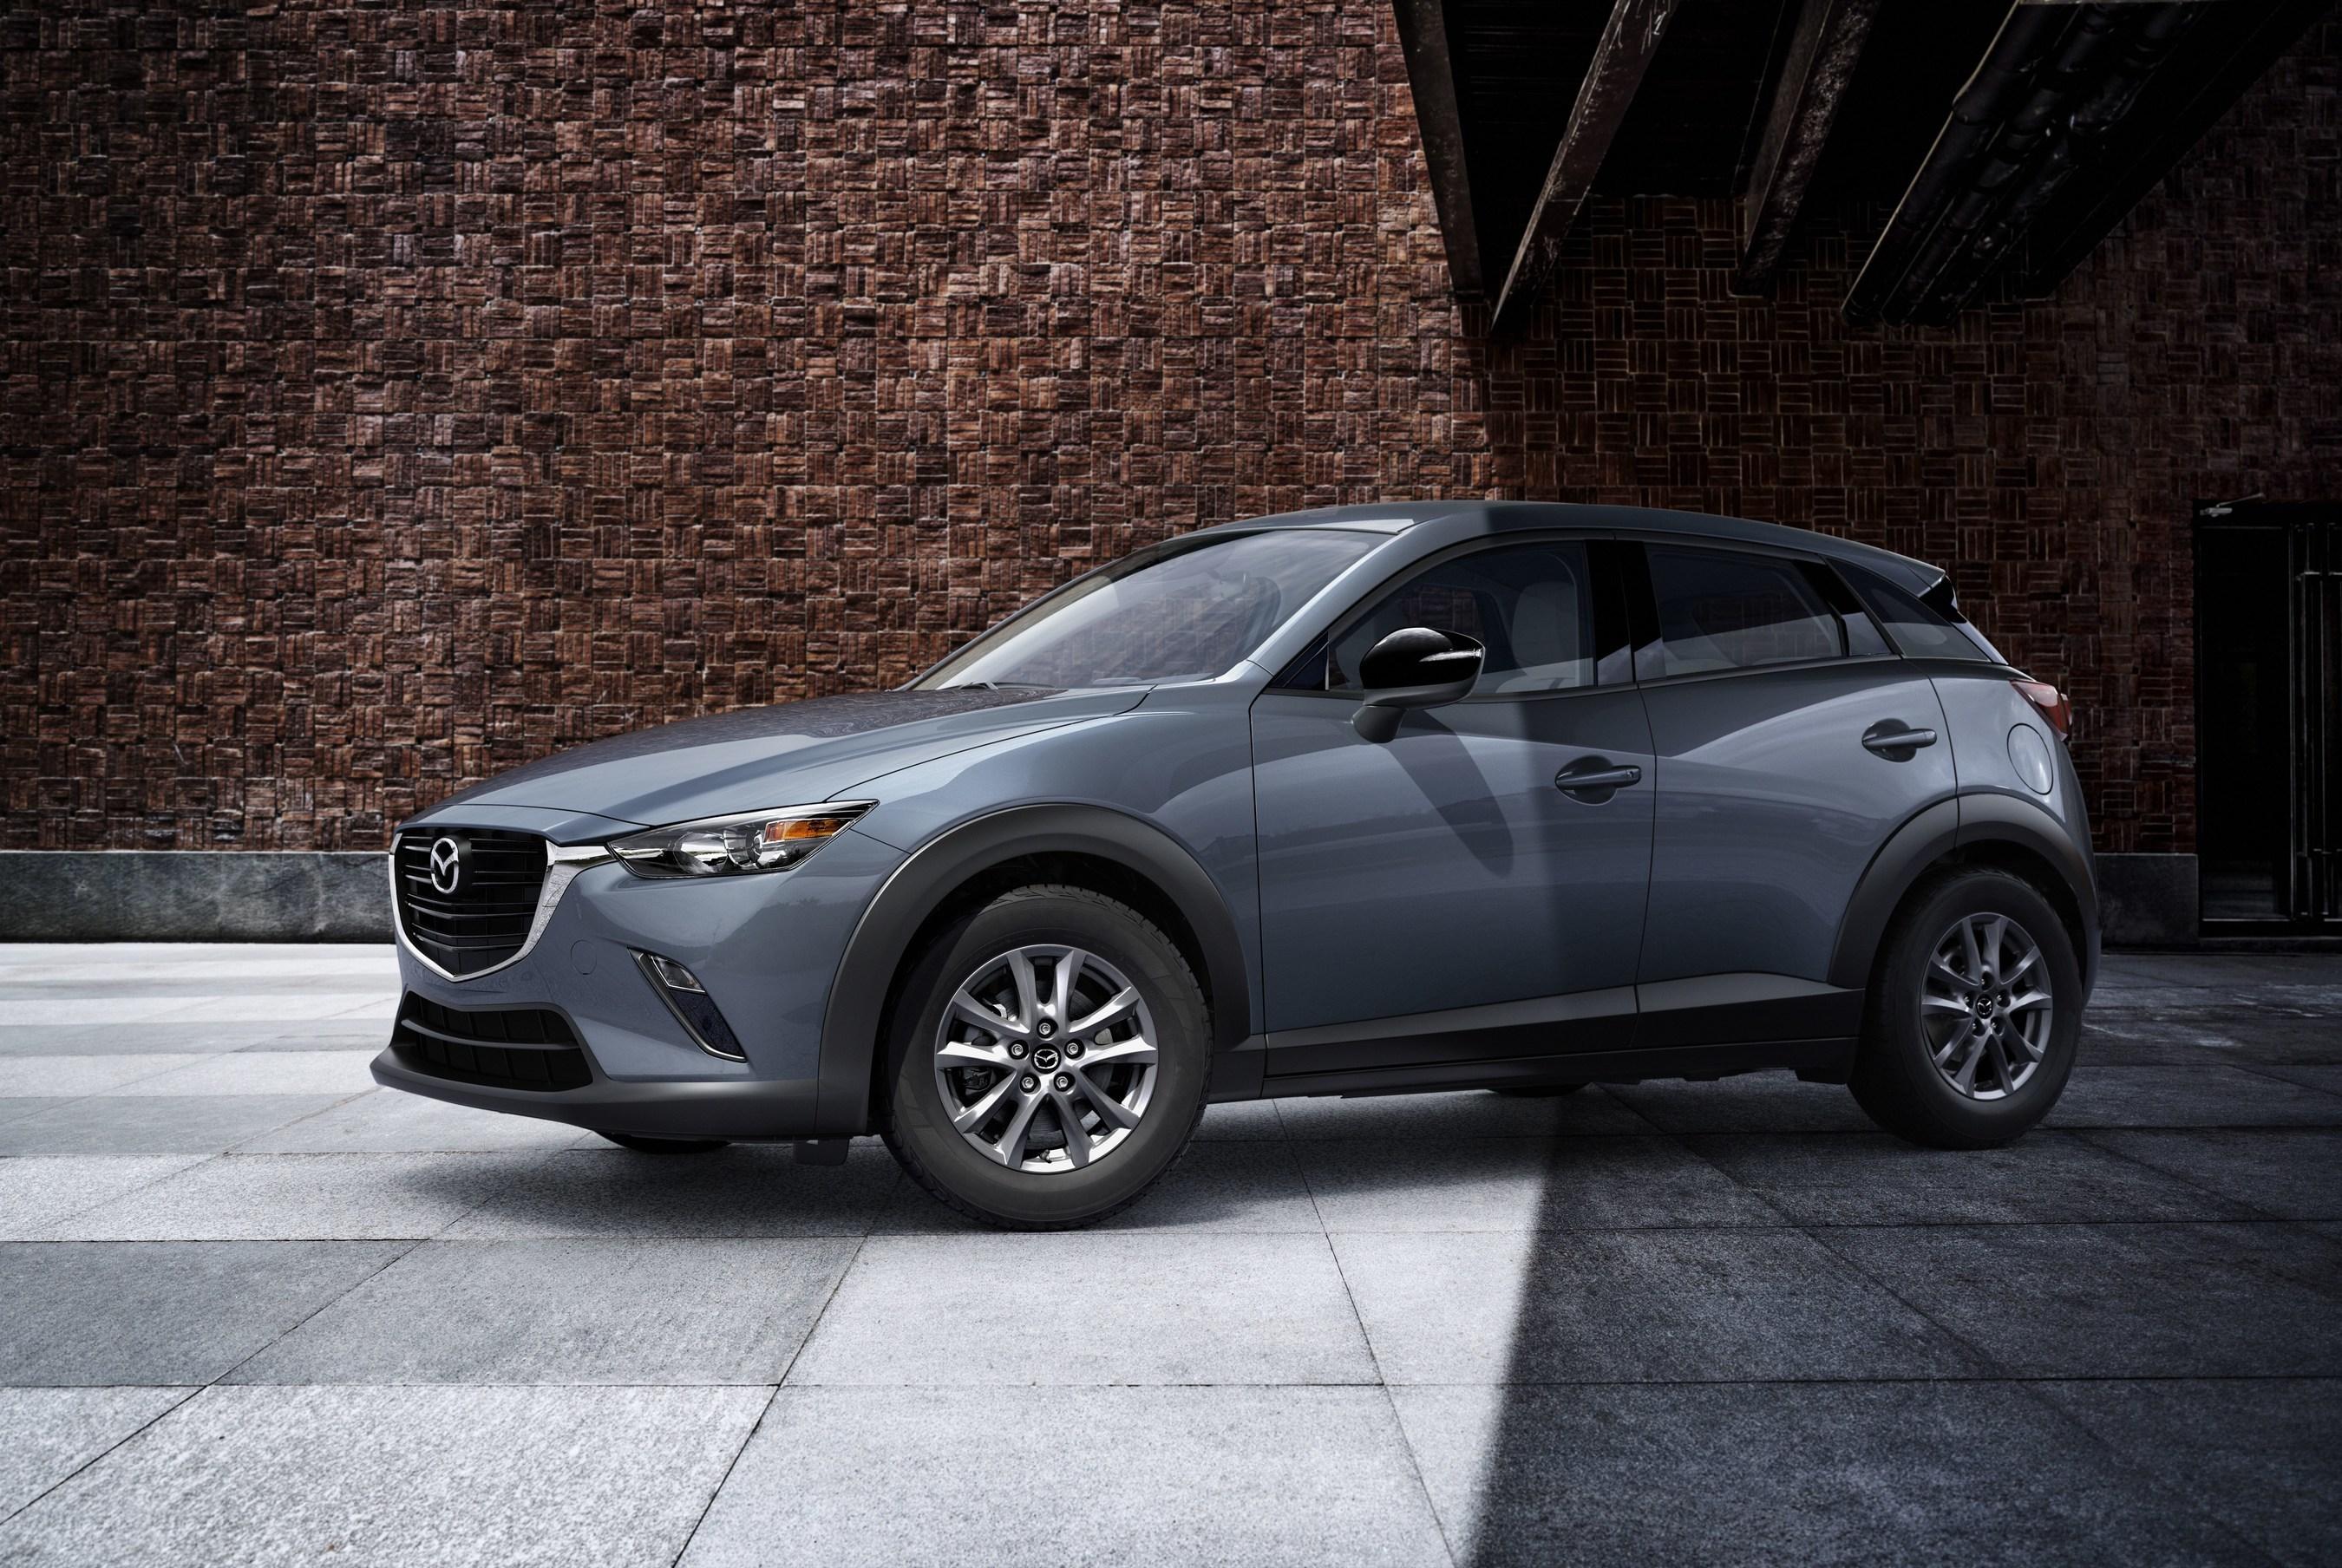 2021 Mazda CX-3 Performance and New Engine